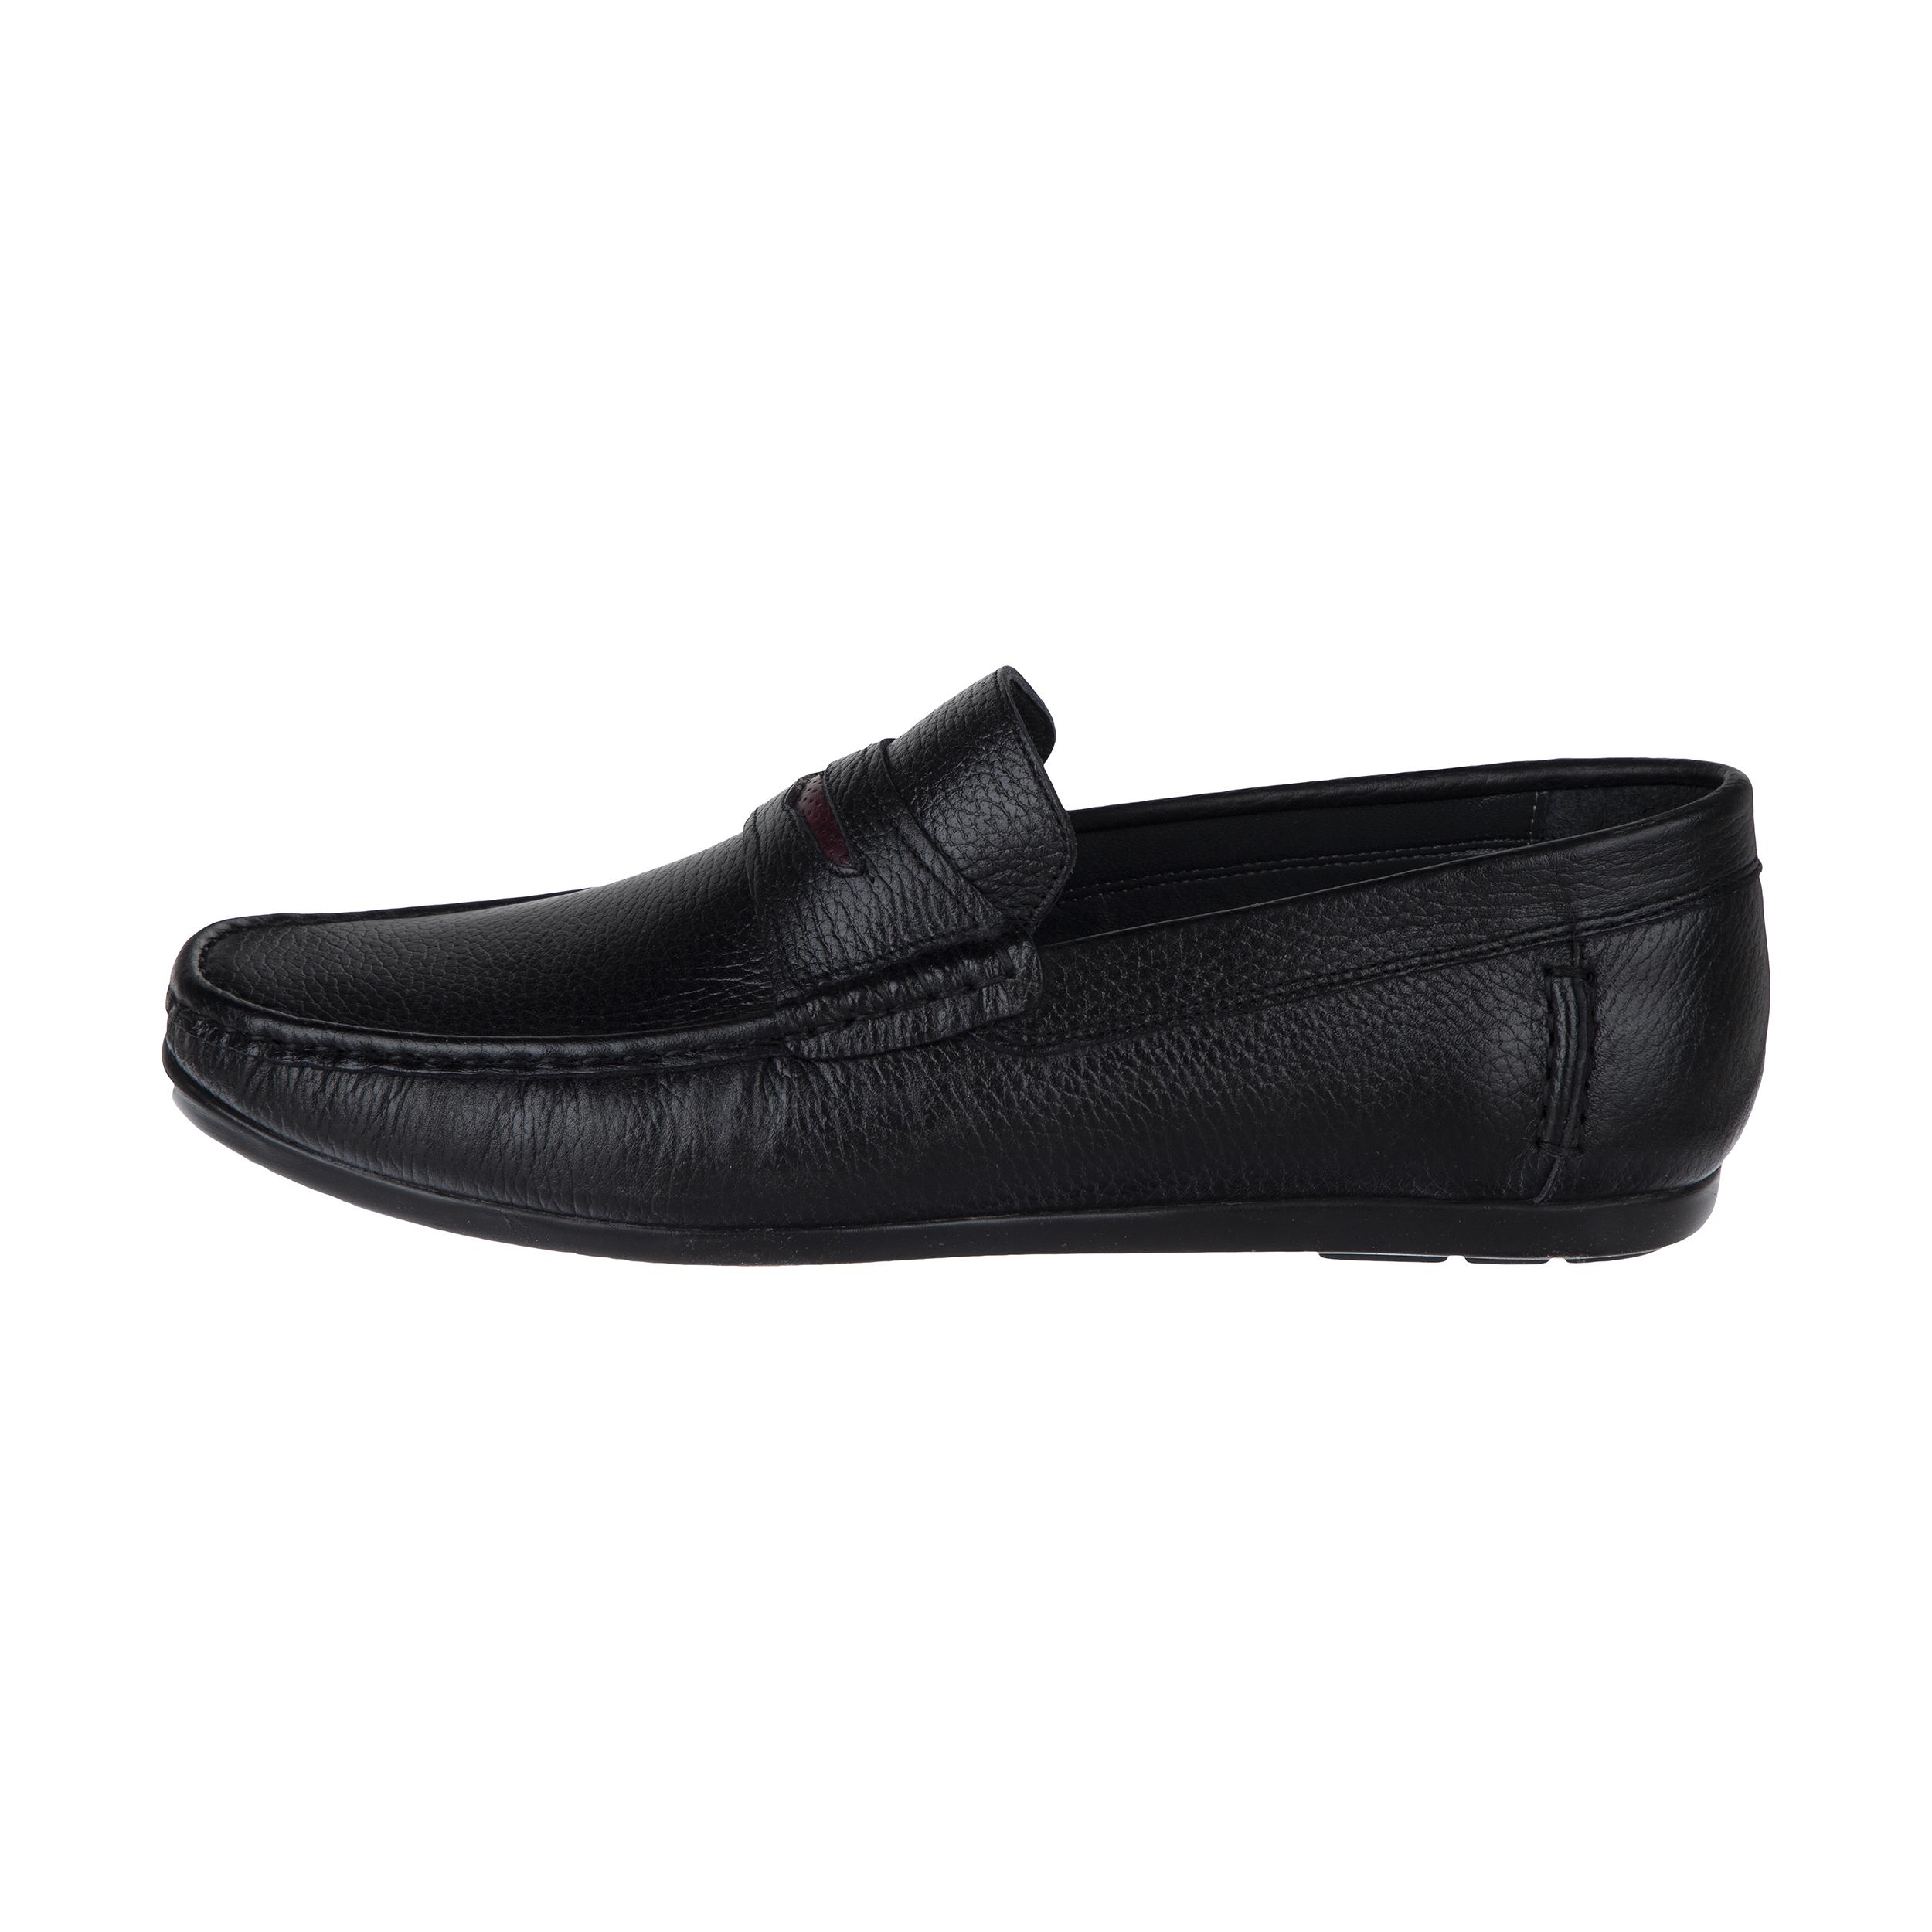 کفش روزمره مردانه ساتین مدل 7611A503101